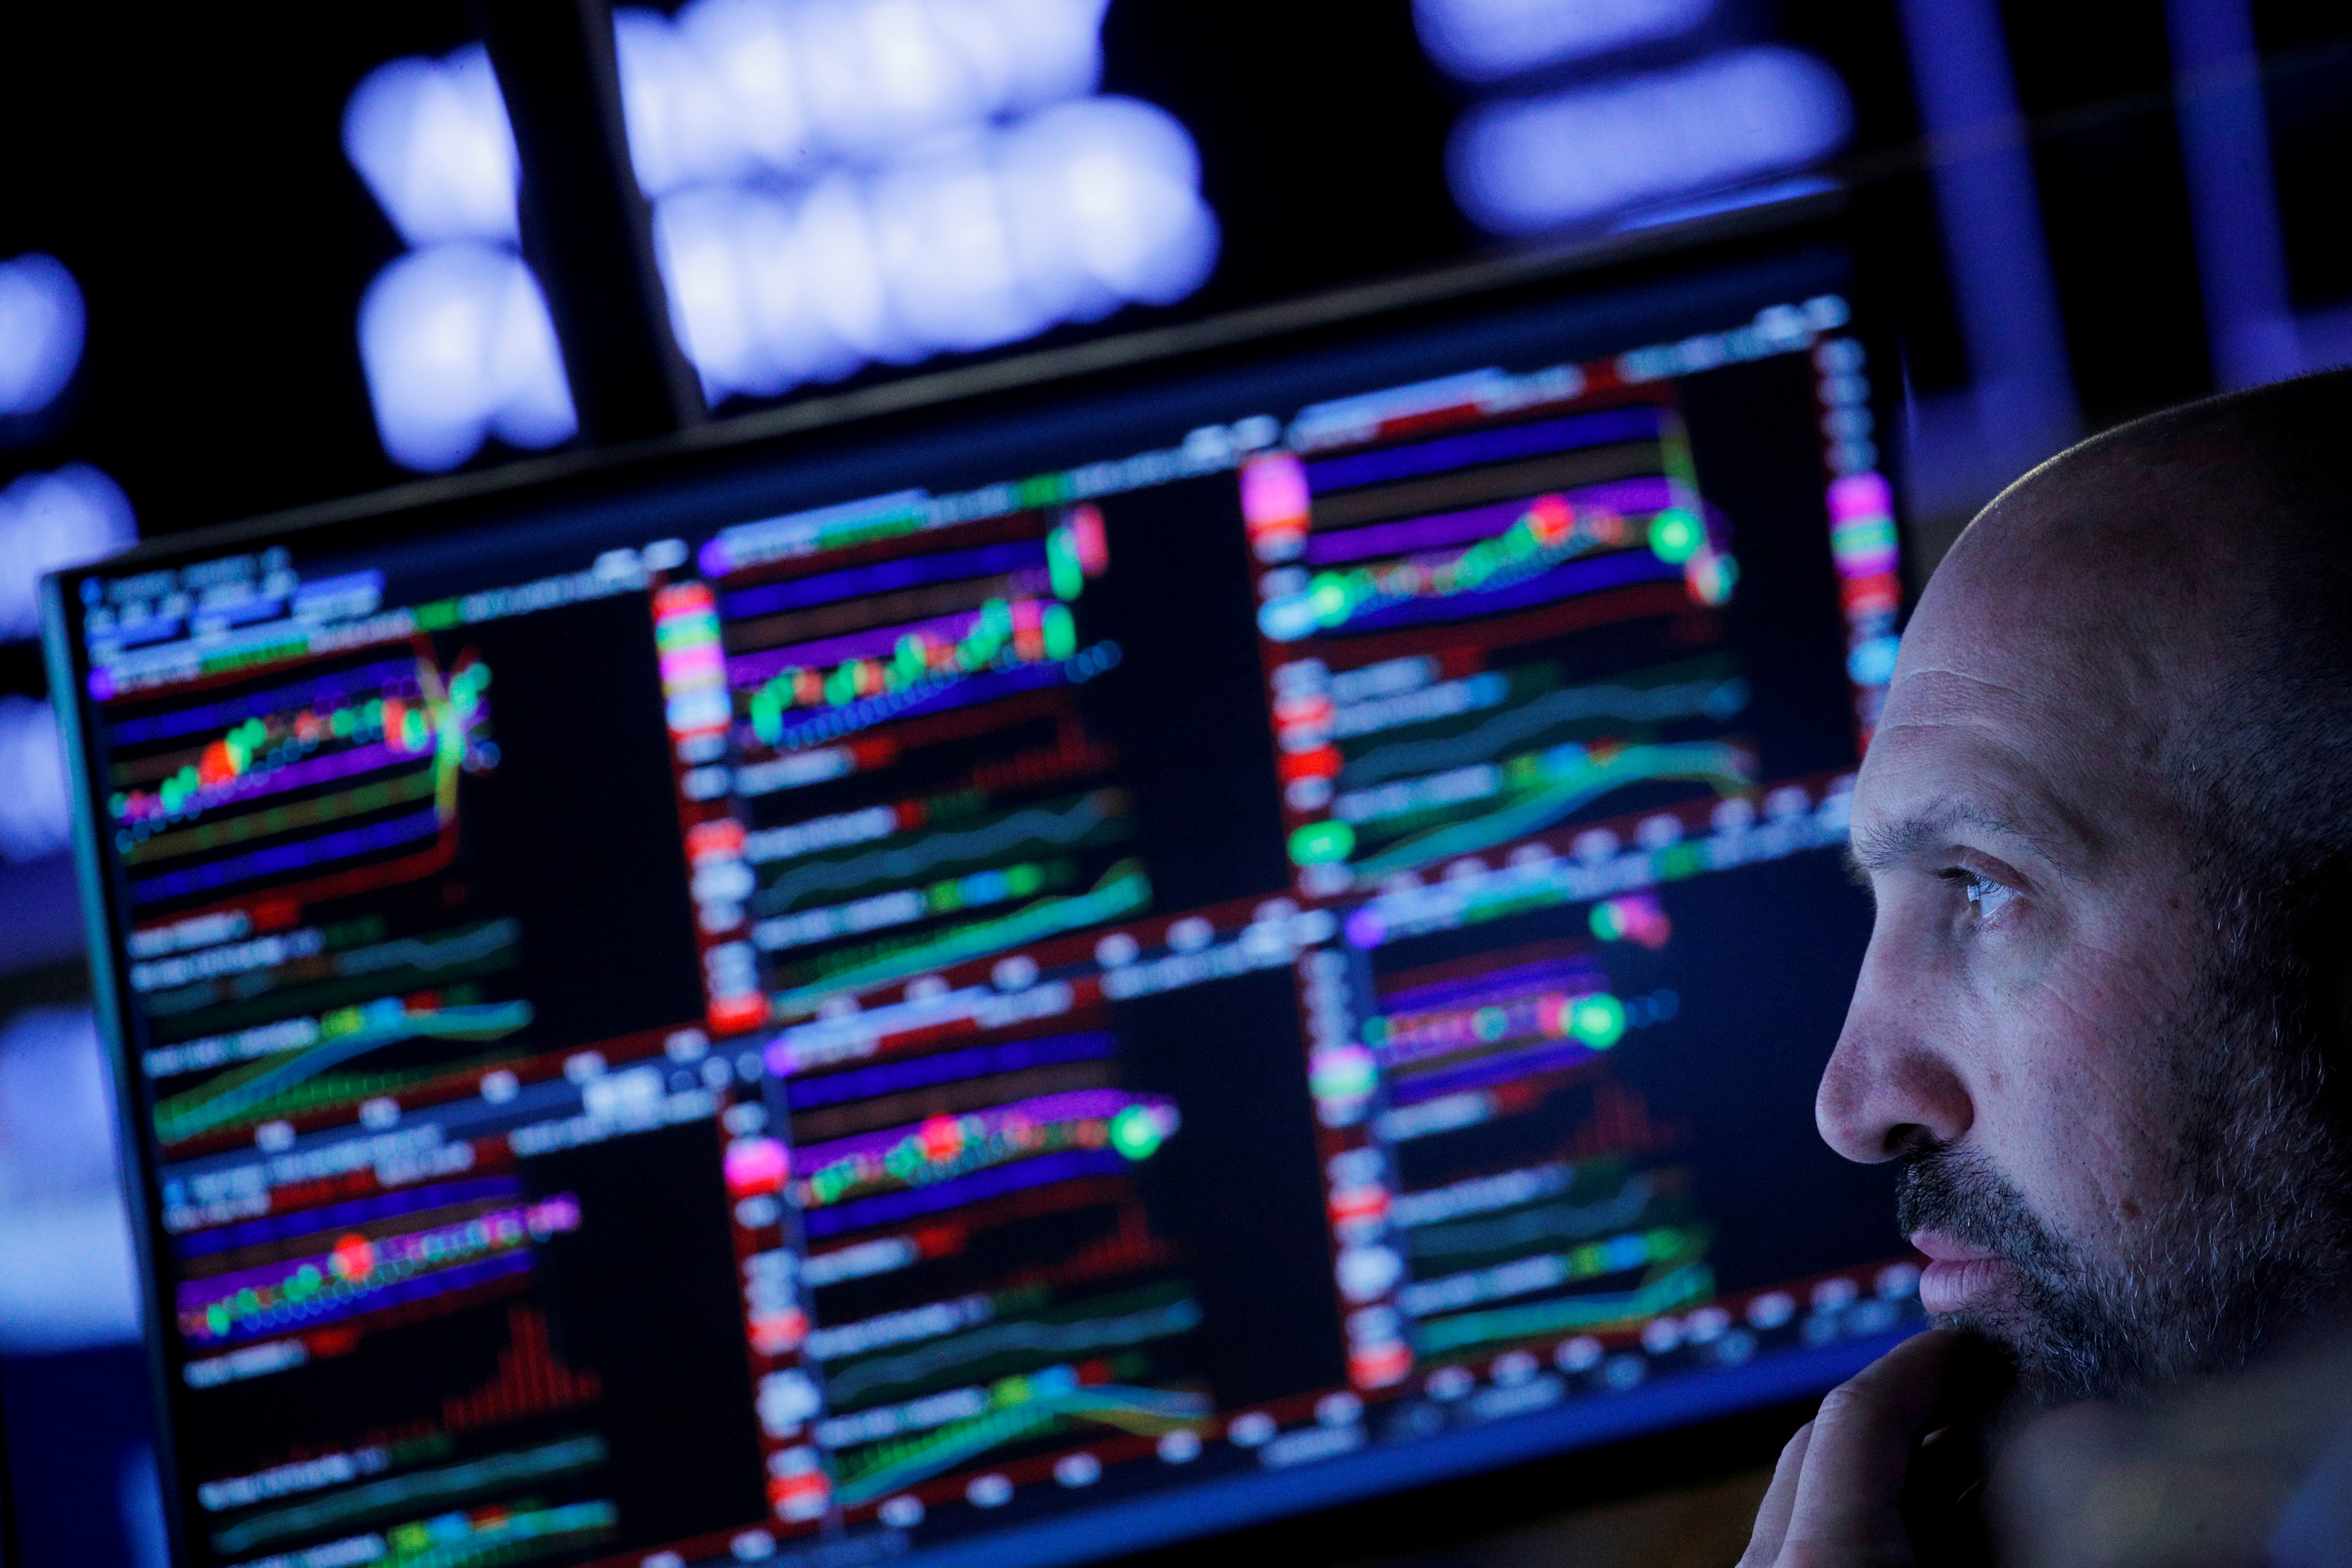 Traders work on the floor of the New York Stock Exchange (NYSE) in New York City, U.S., September 29, 2021. REUTERS/Brendan McDermid